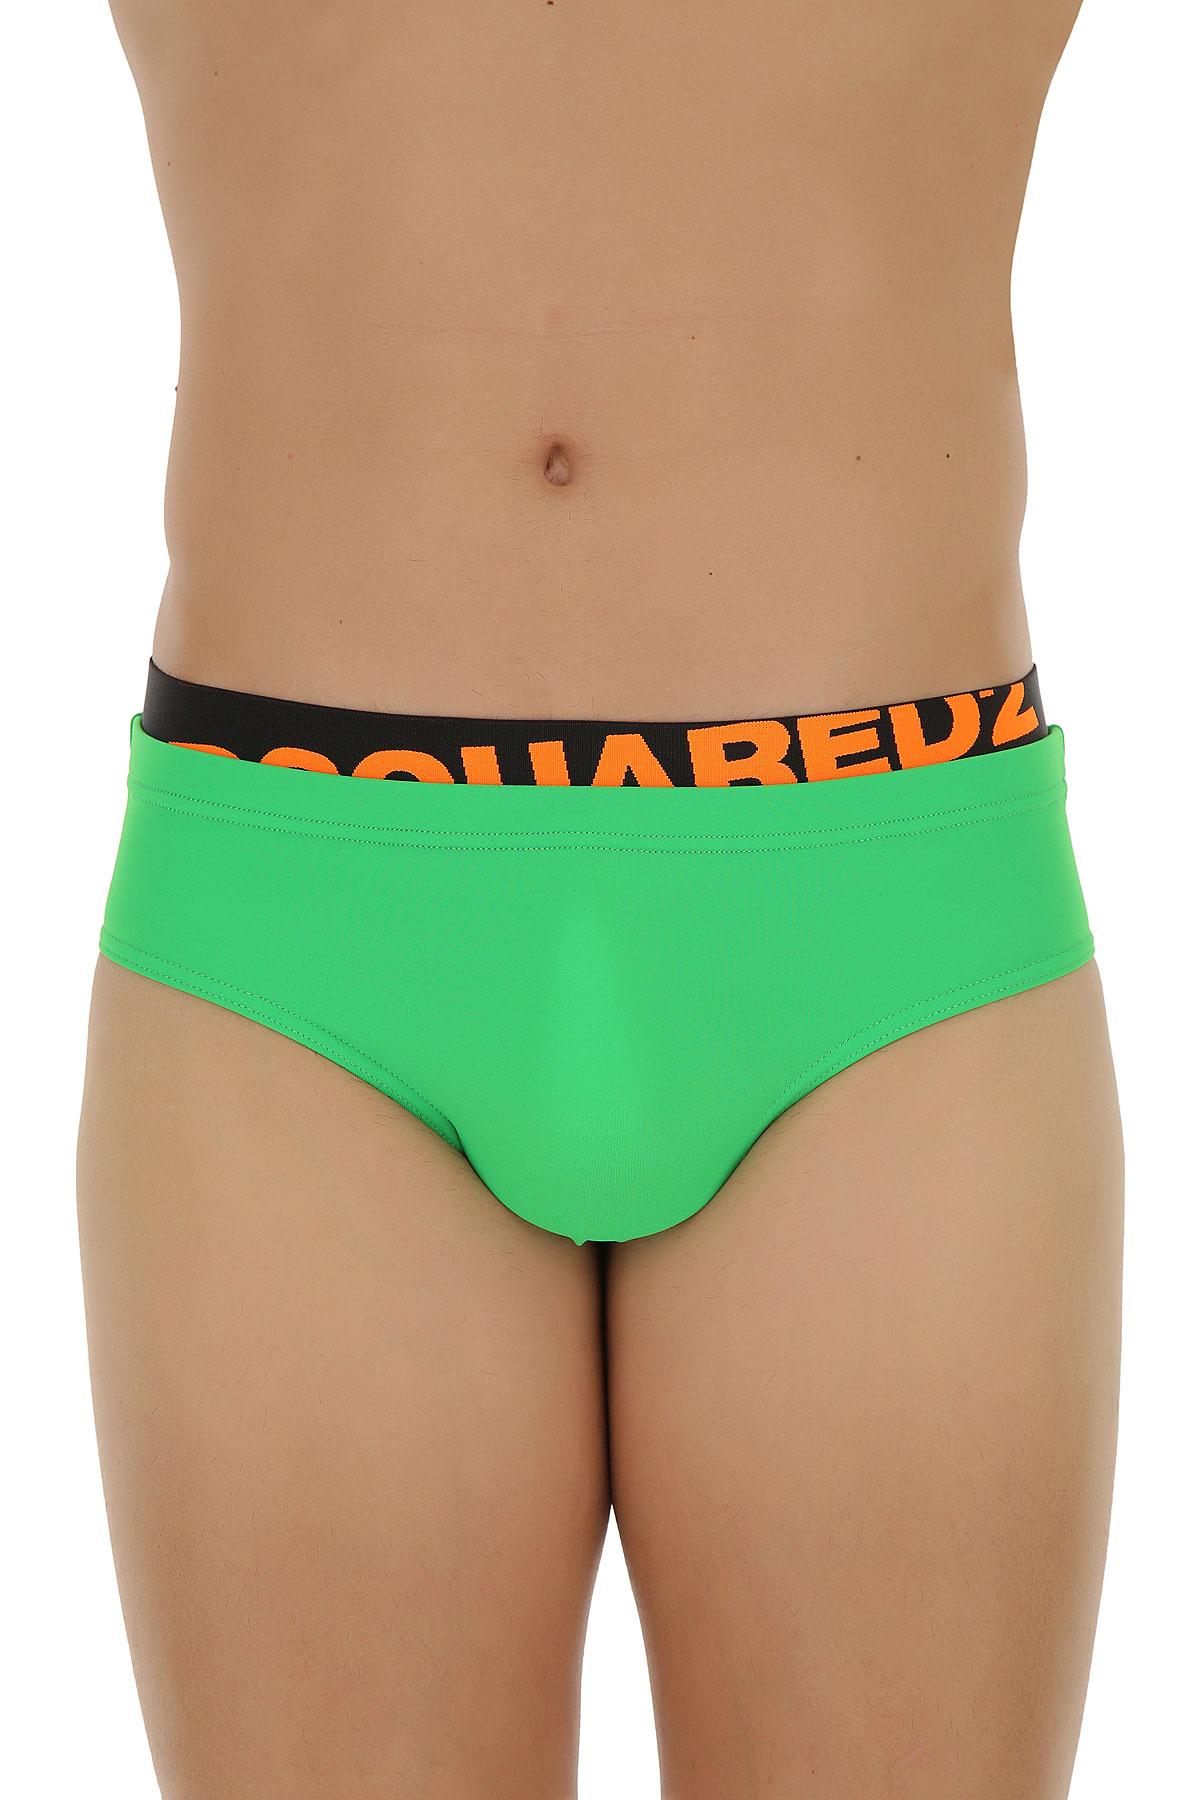 Image of Dsquared2 Swim Briefs for Men On Sale, Absinthe Green, polyamide, 2017, M (EU 48) L (EU 50) XL (EU 52)